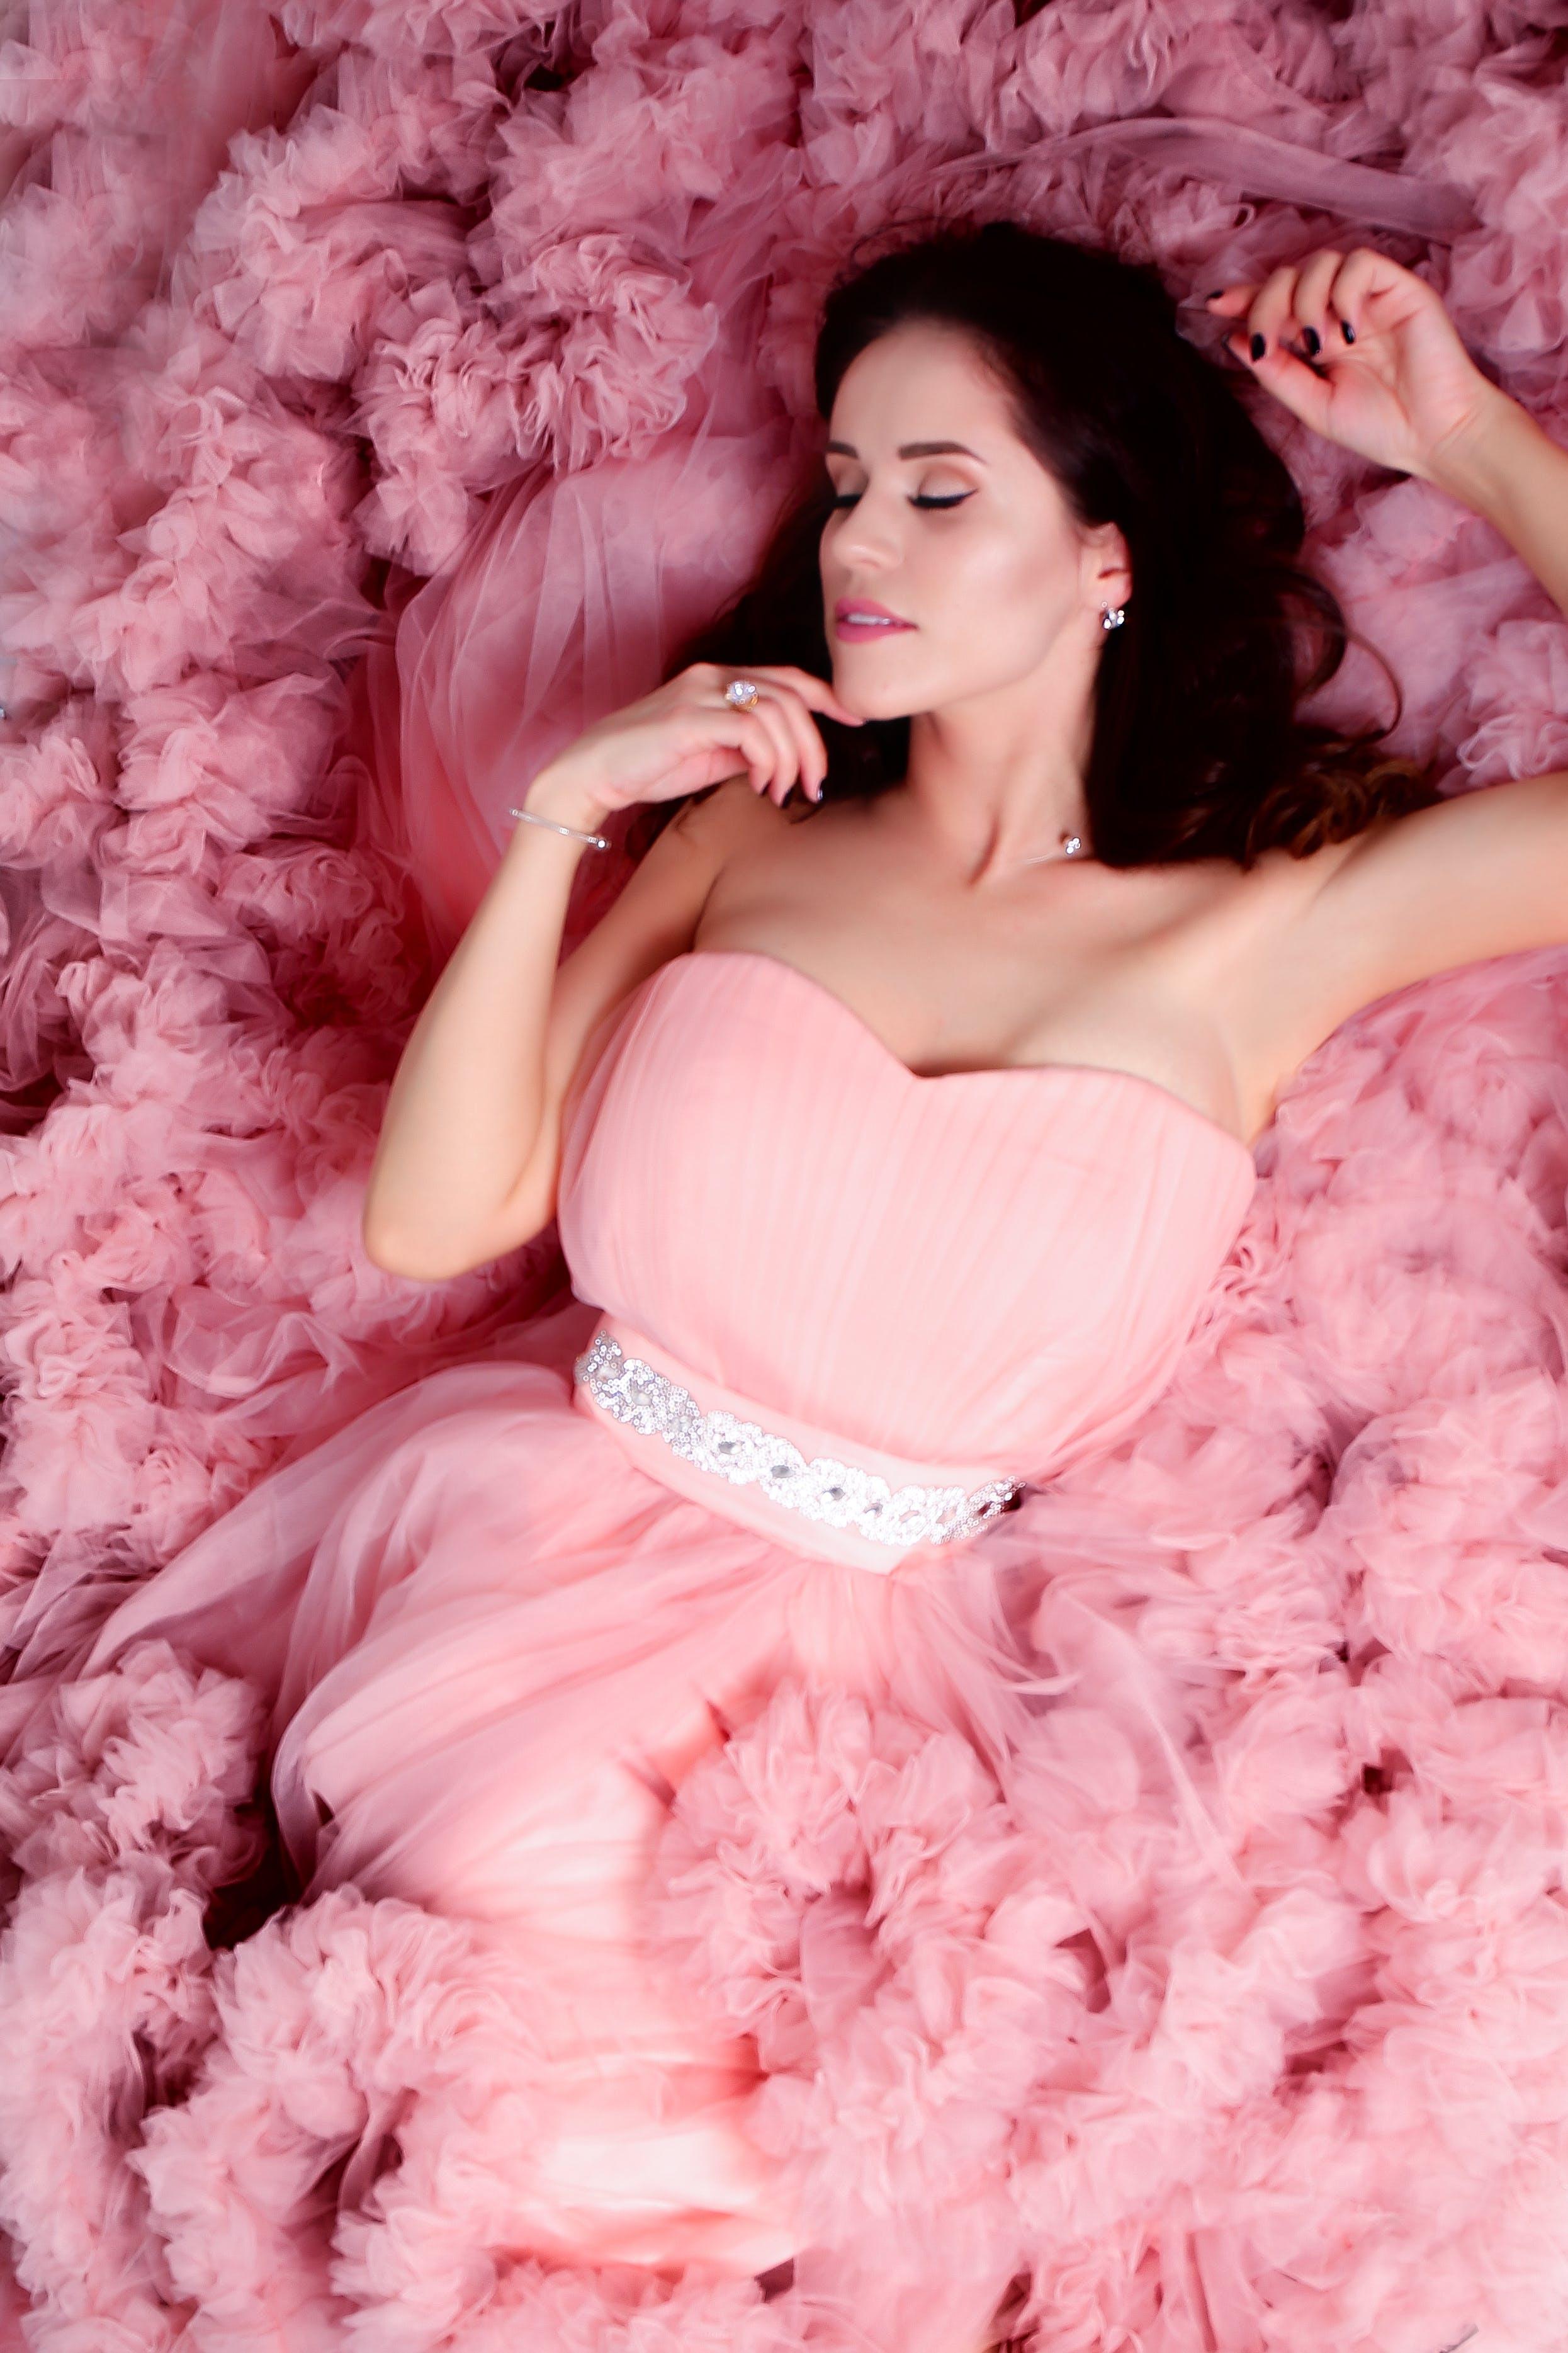 Kostenloses Stock Foto zu fashion, person, liebe, frau